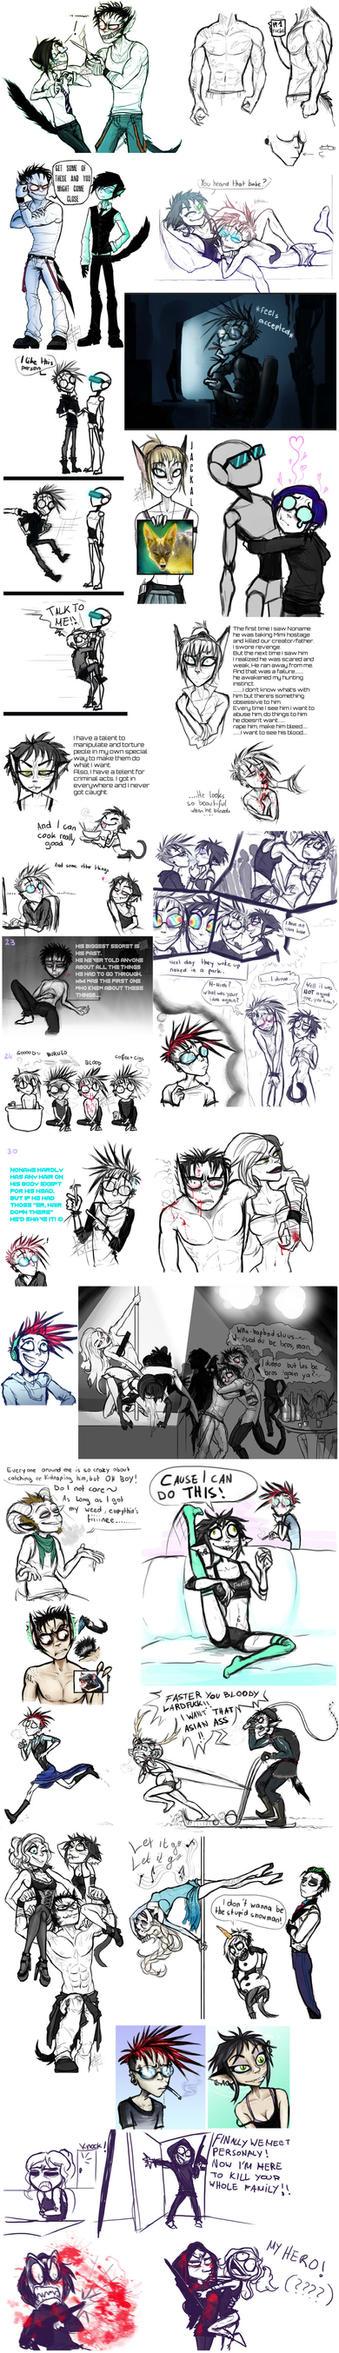 Tumblr Dump 1 by Spaffi